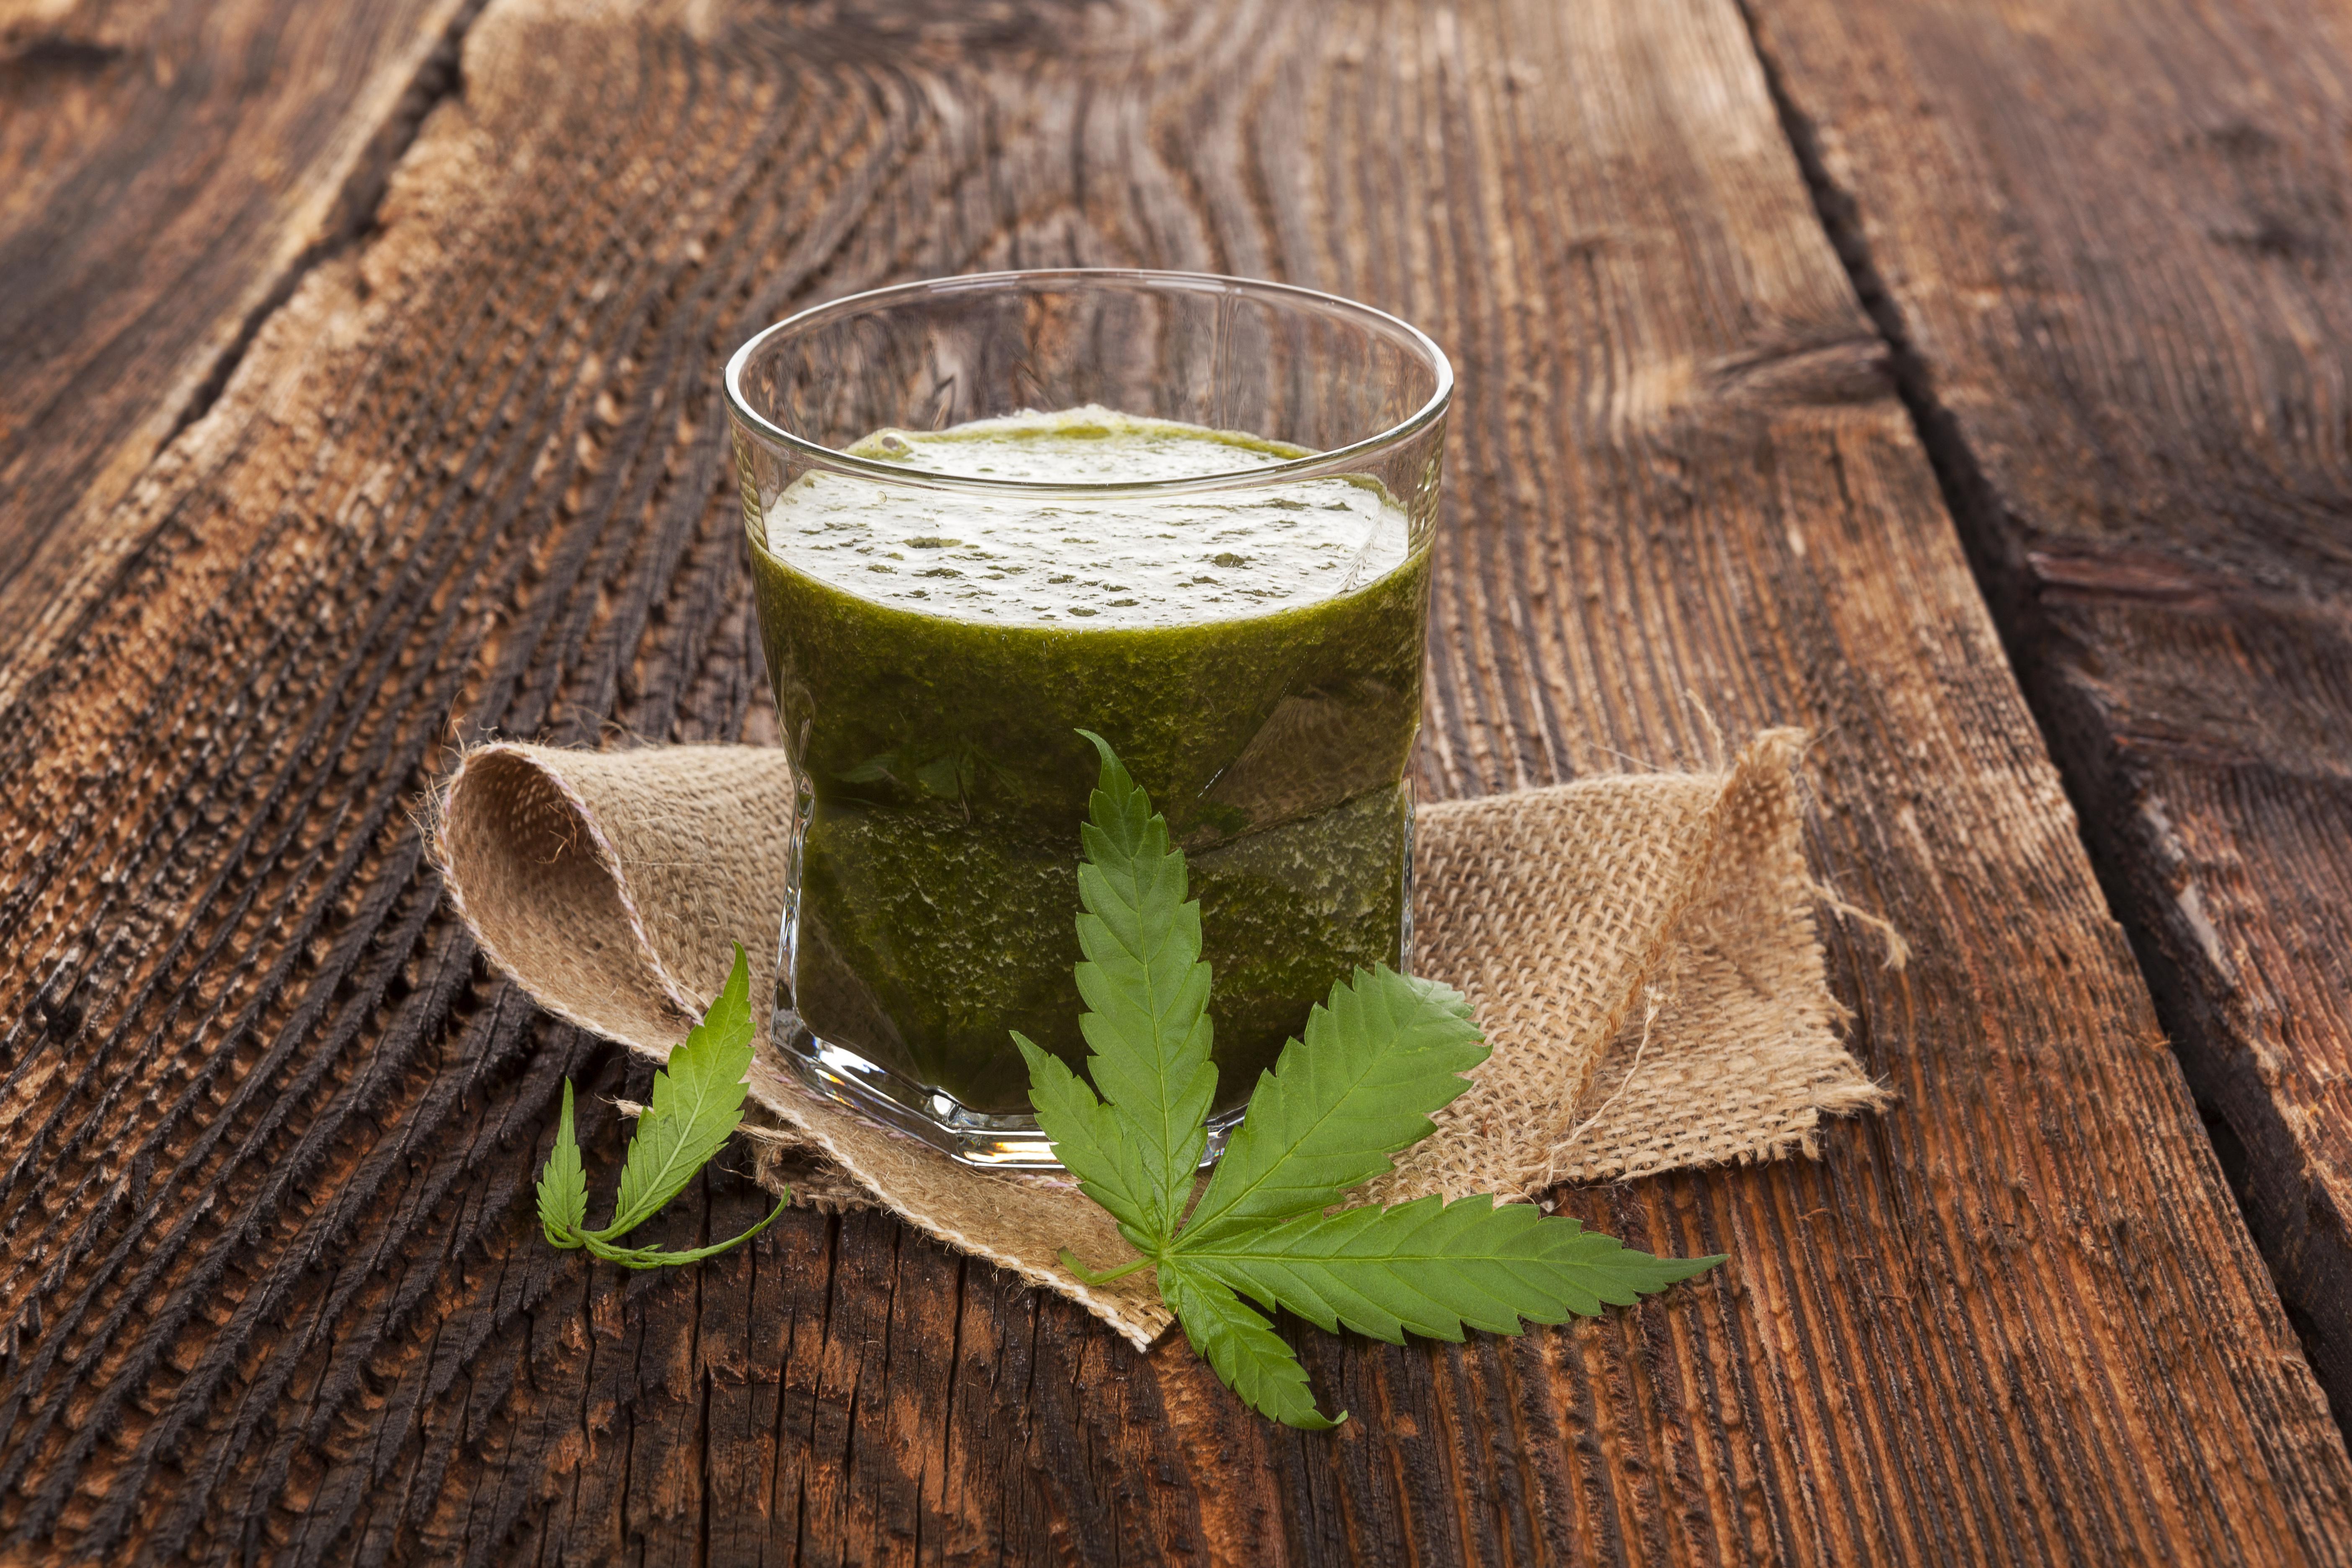 Raw Cannabis juicing